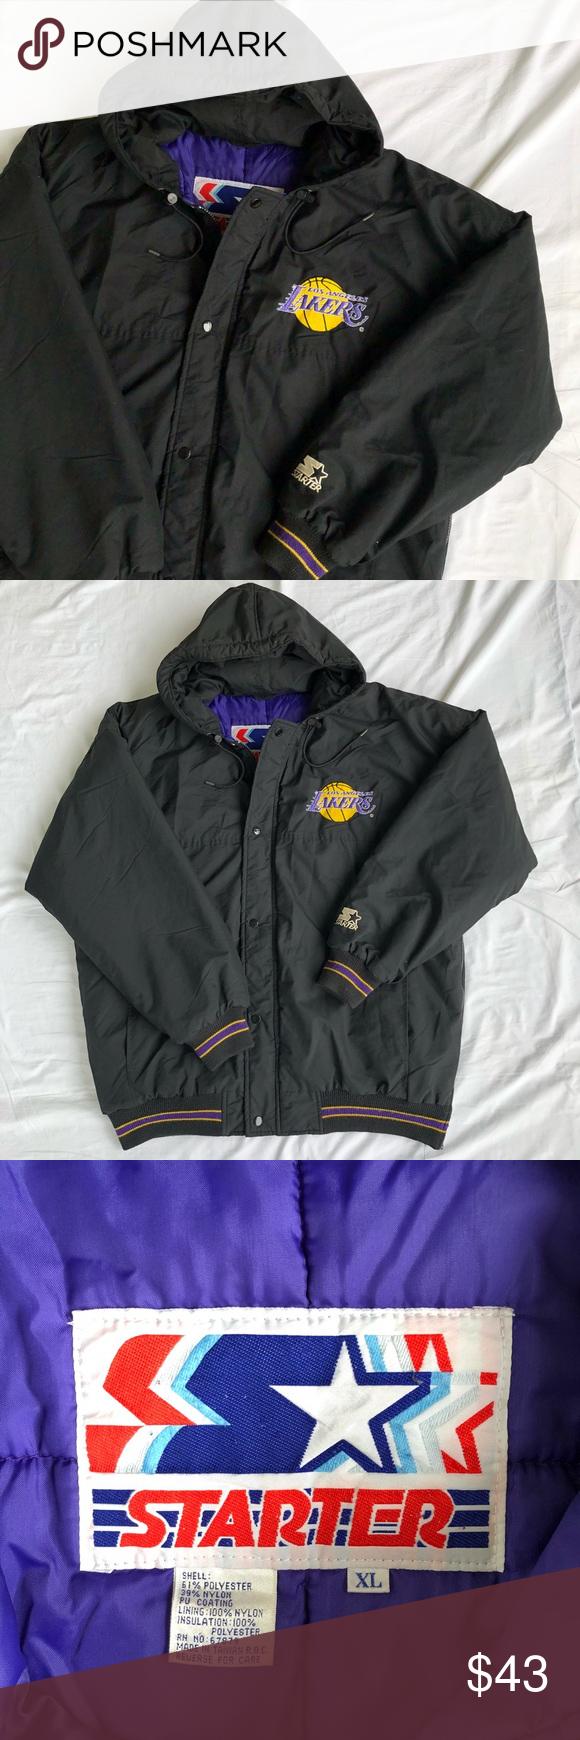 Vintage Starter Nba La Lakers Puffy Jacket Vintage Starter Nba Los Angeles Lakers Embroidered Spellout Logo Black Puffy Jac Puffy Jacket Jackets Clothes Design